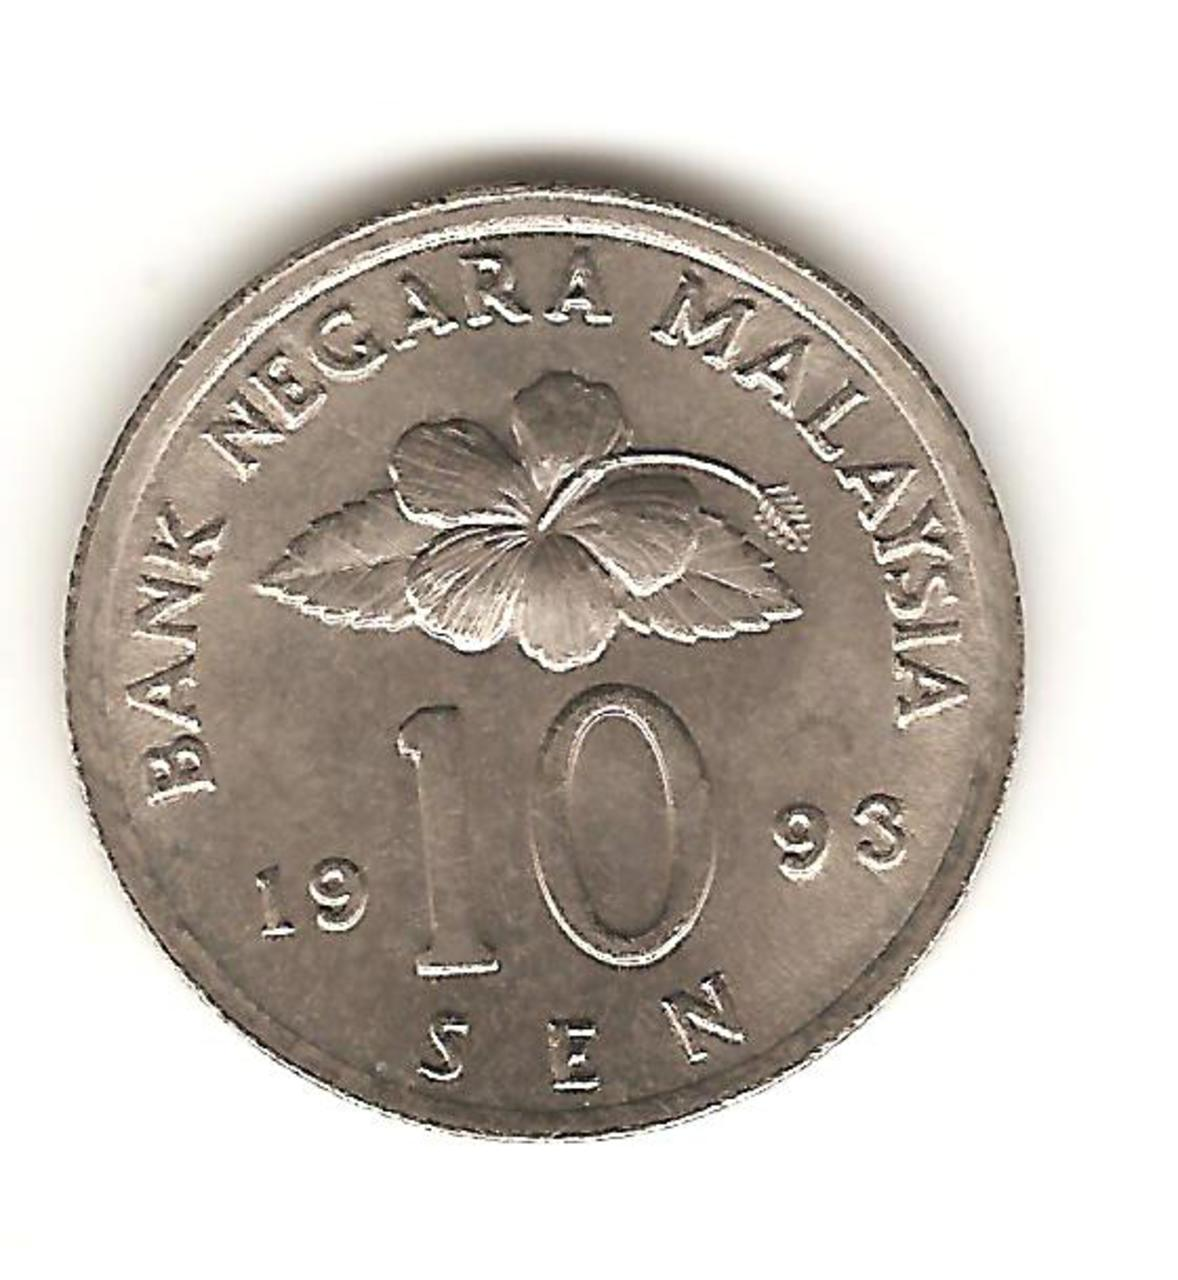 10 sen de 1993 Malasia Image